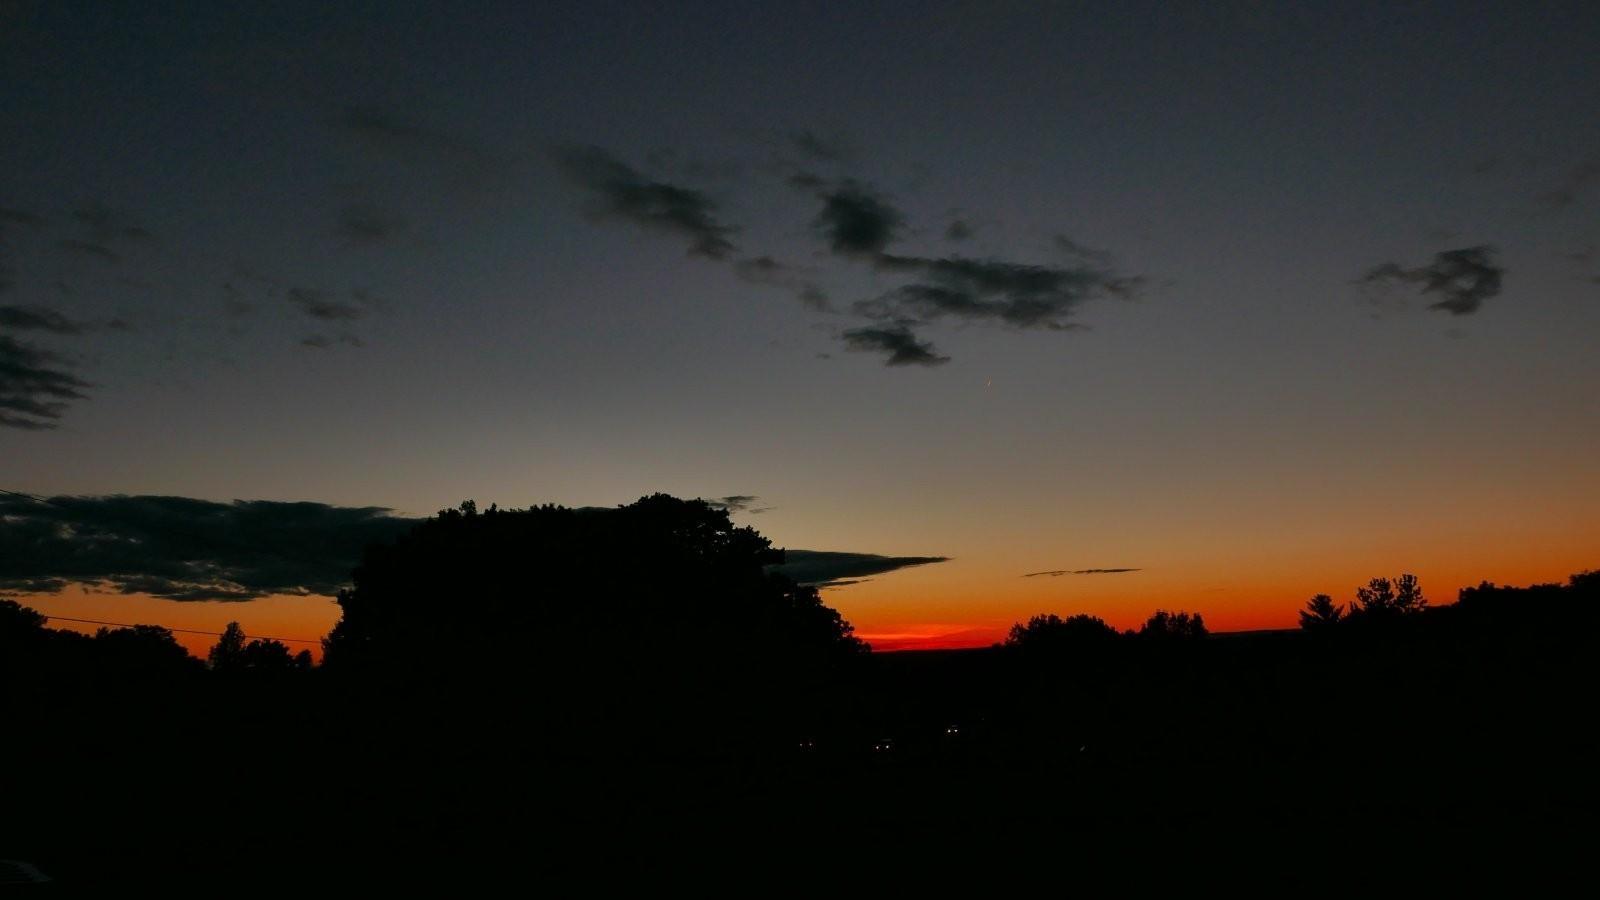 LX100 Frear park sunset 002.JPG